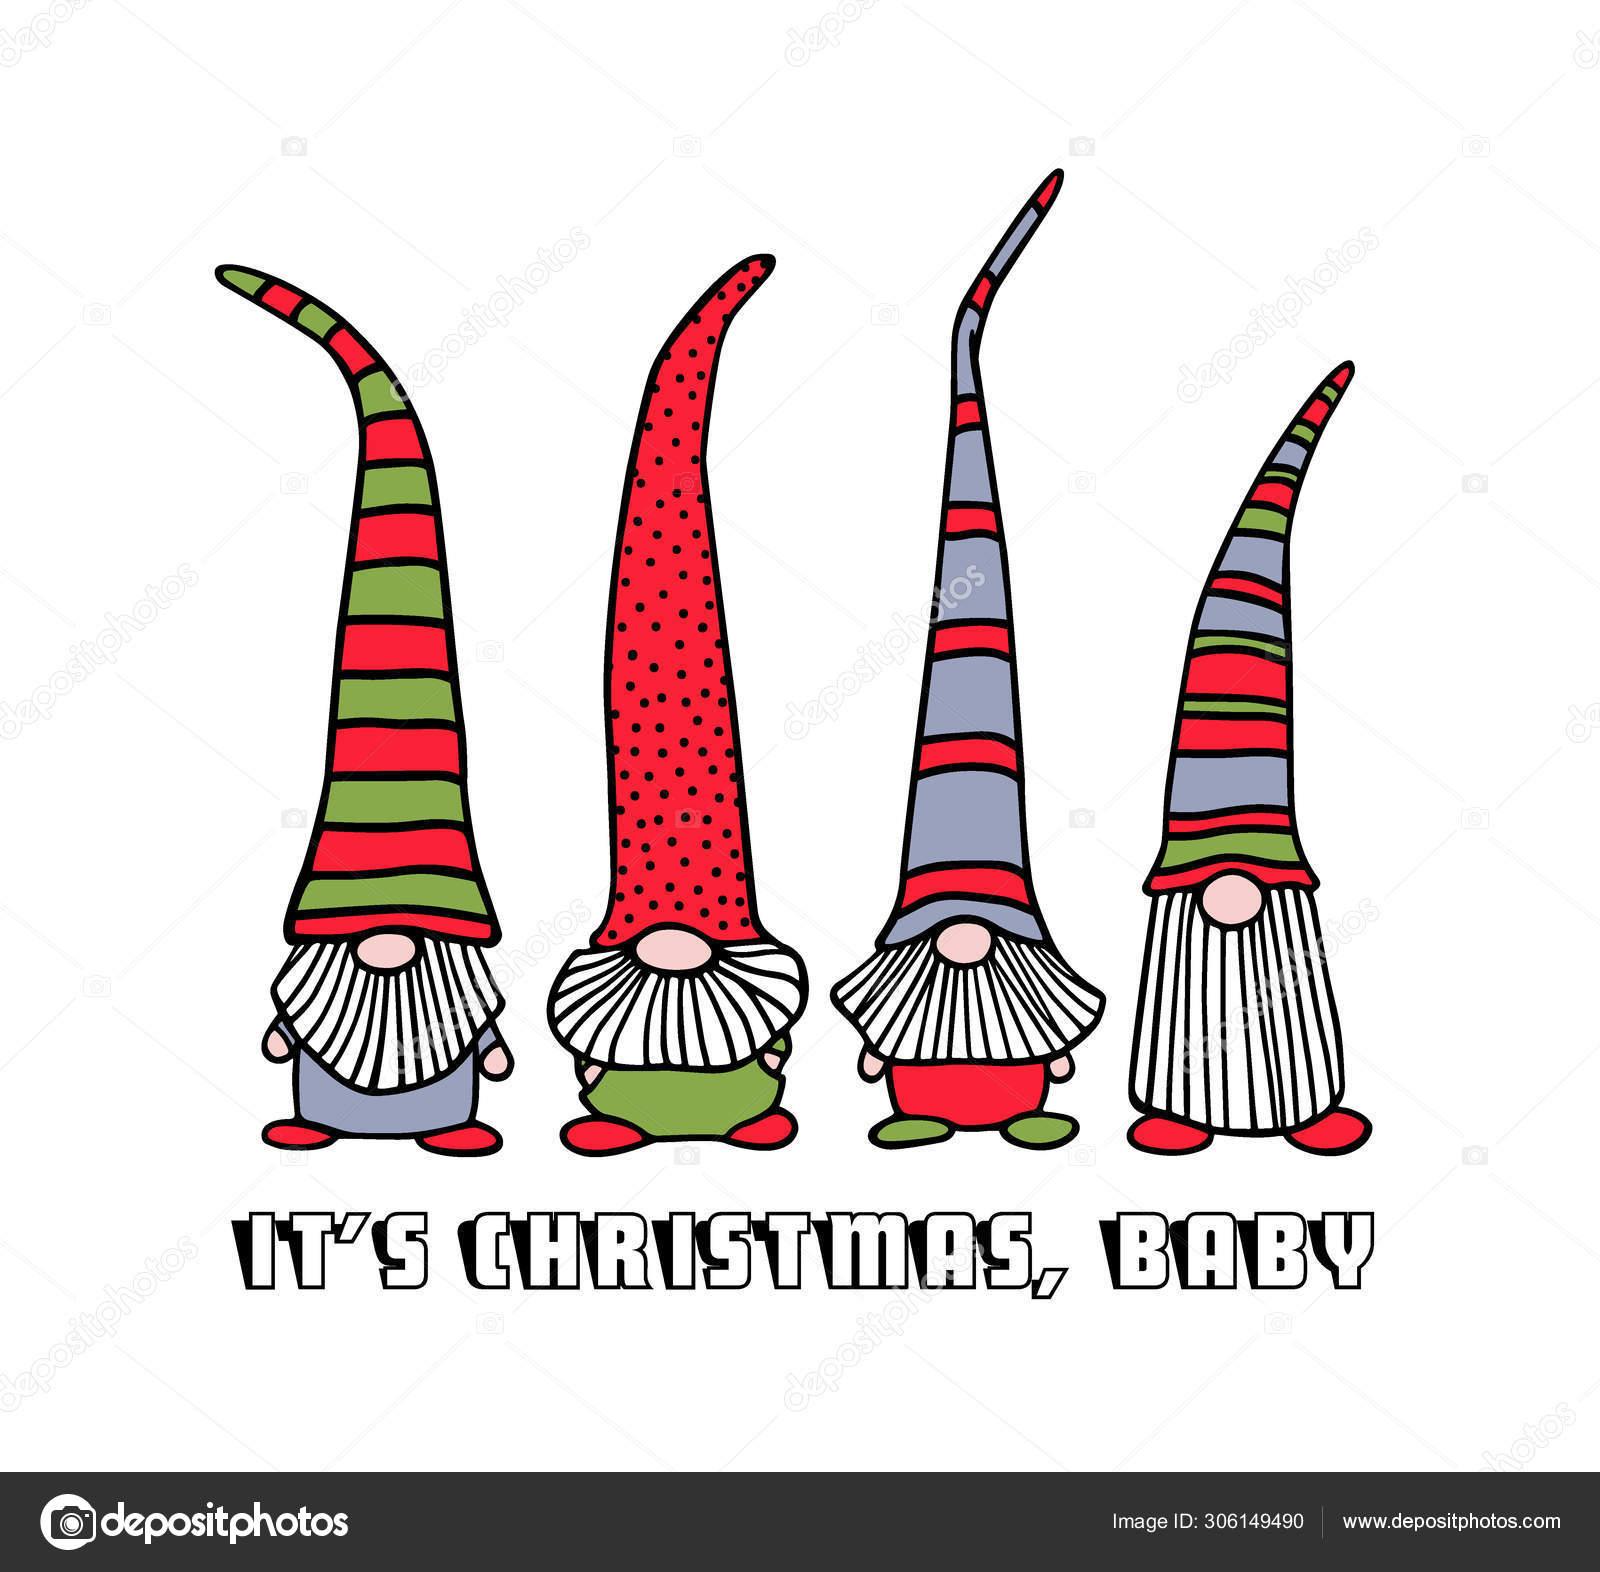 Christmas Gnomes Clipart.Hand Drawn Christmas Gnomes Stock Vector C Ezhevica 306149490